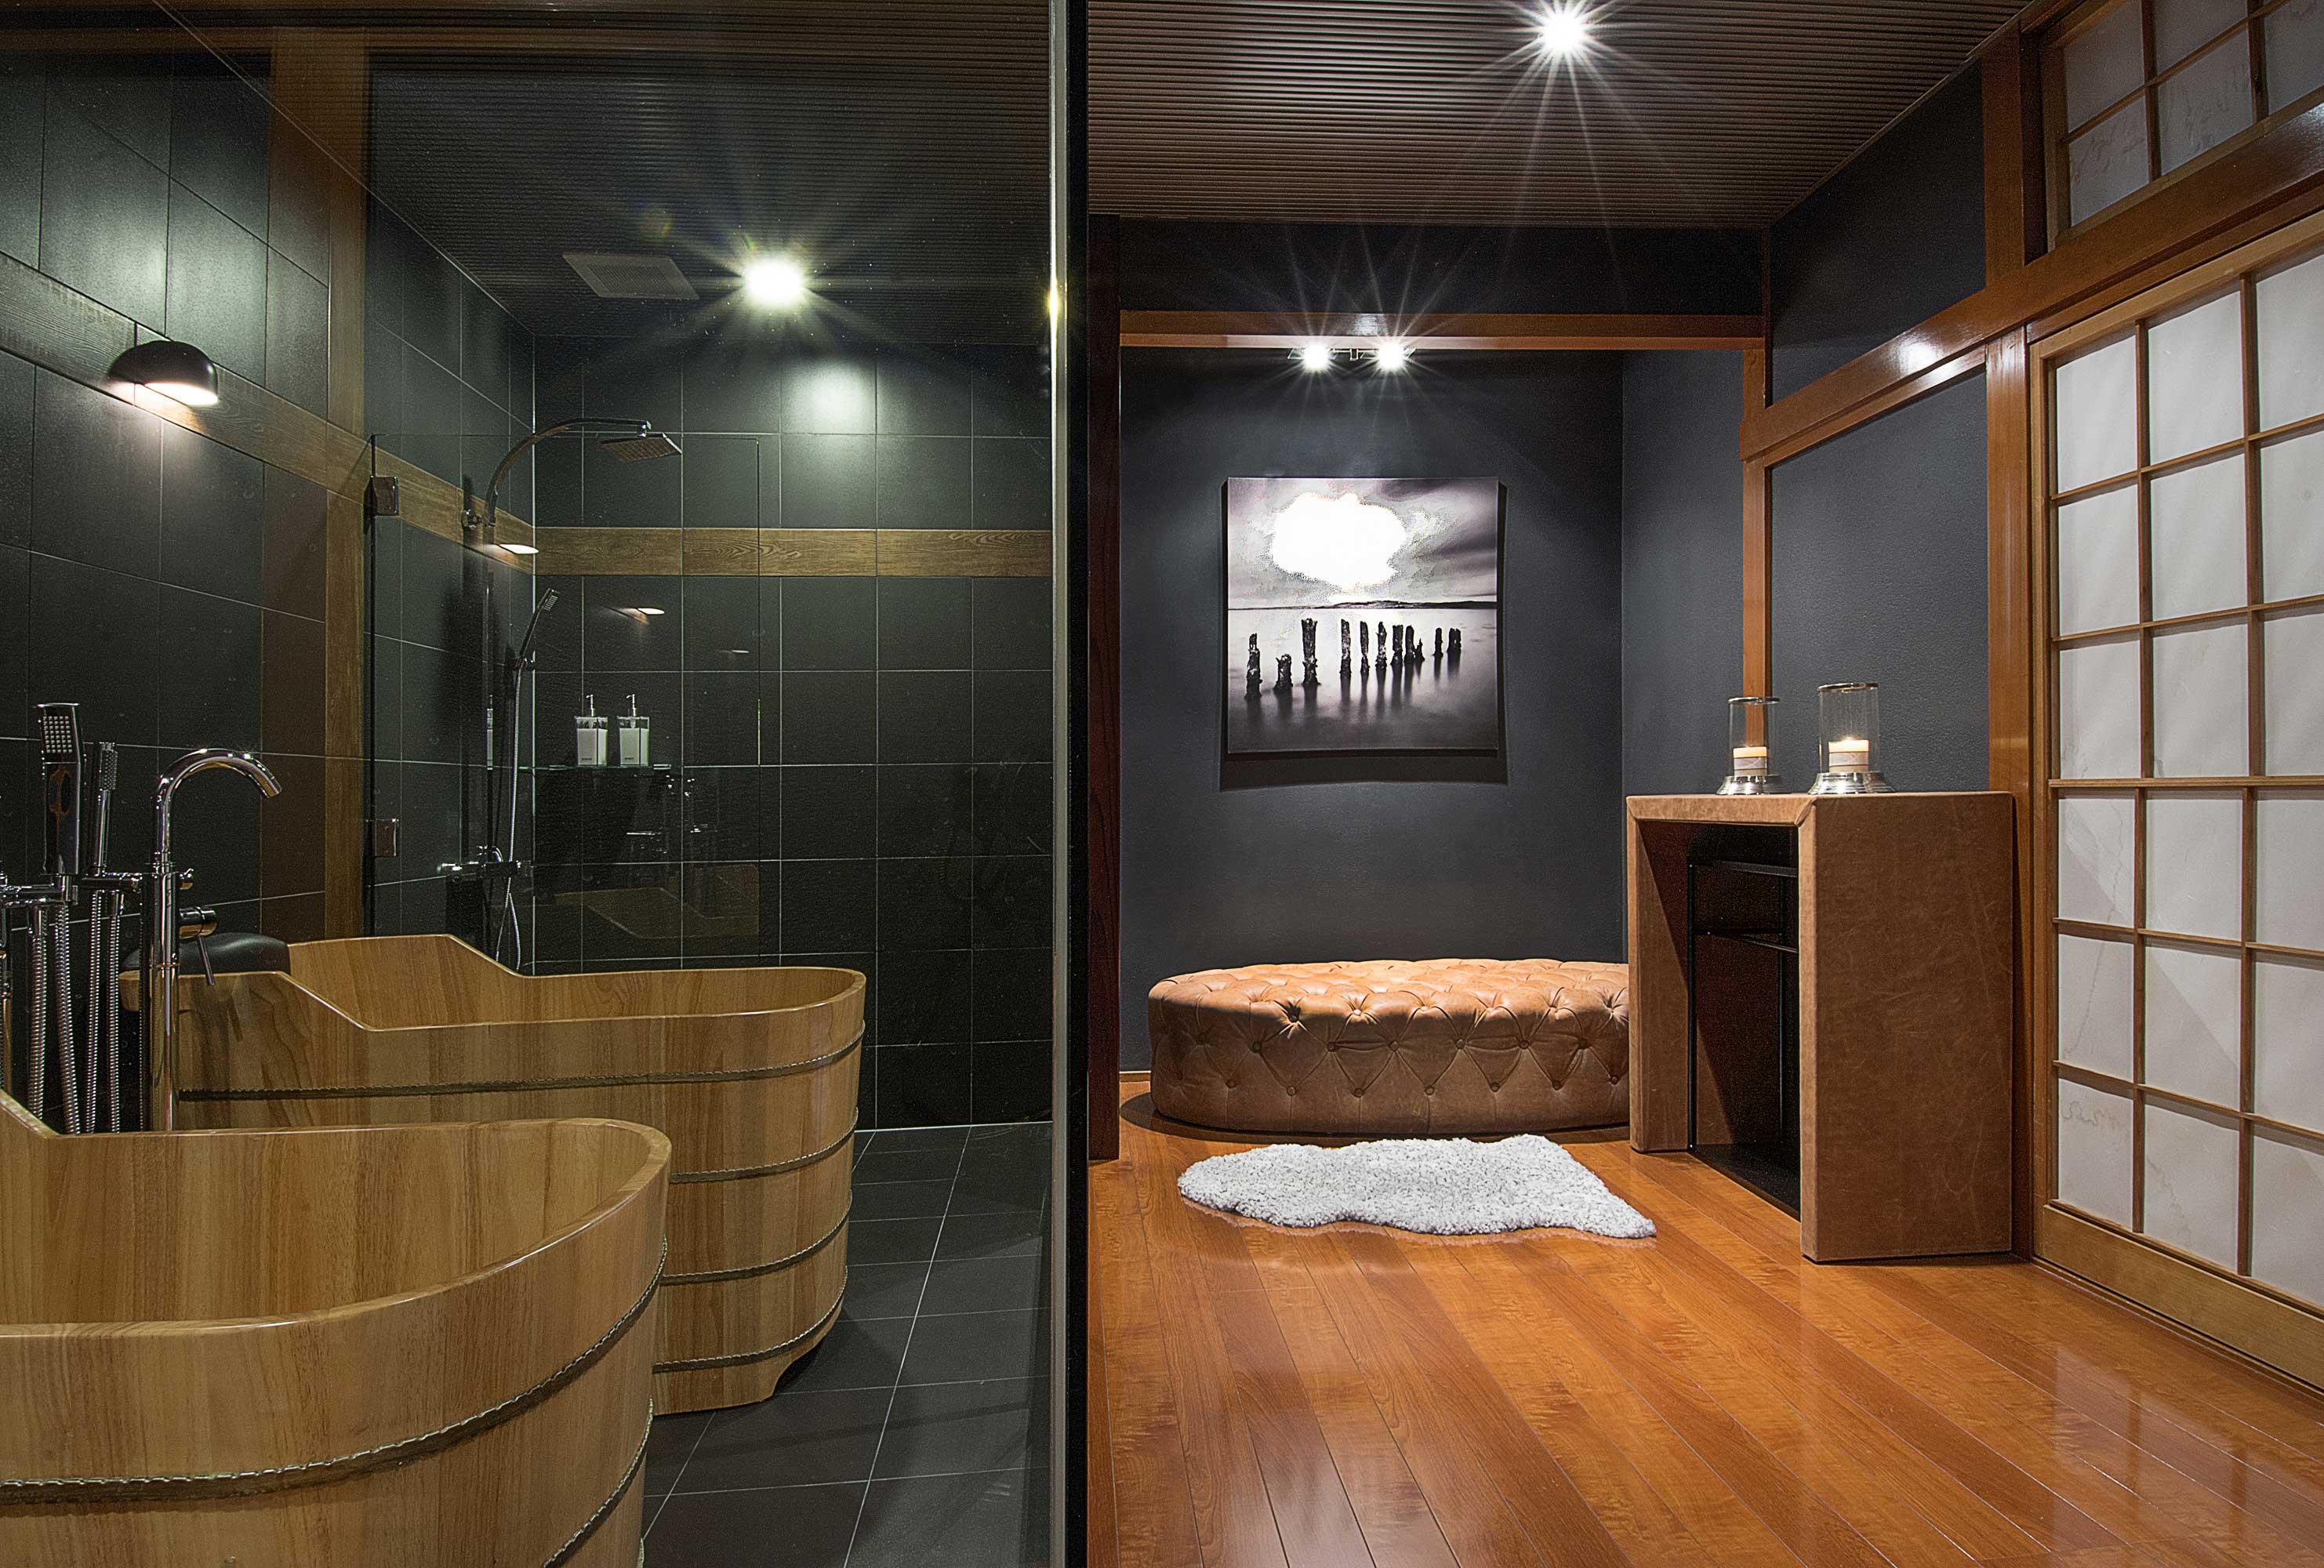 Unique Bamboo Flooring in Bathroom - HomesFeed